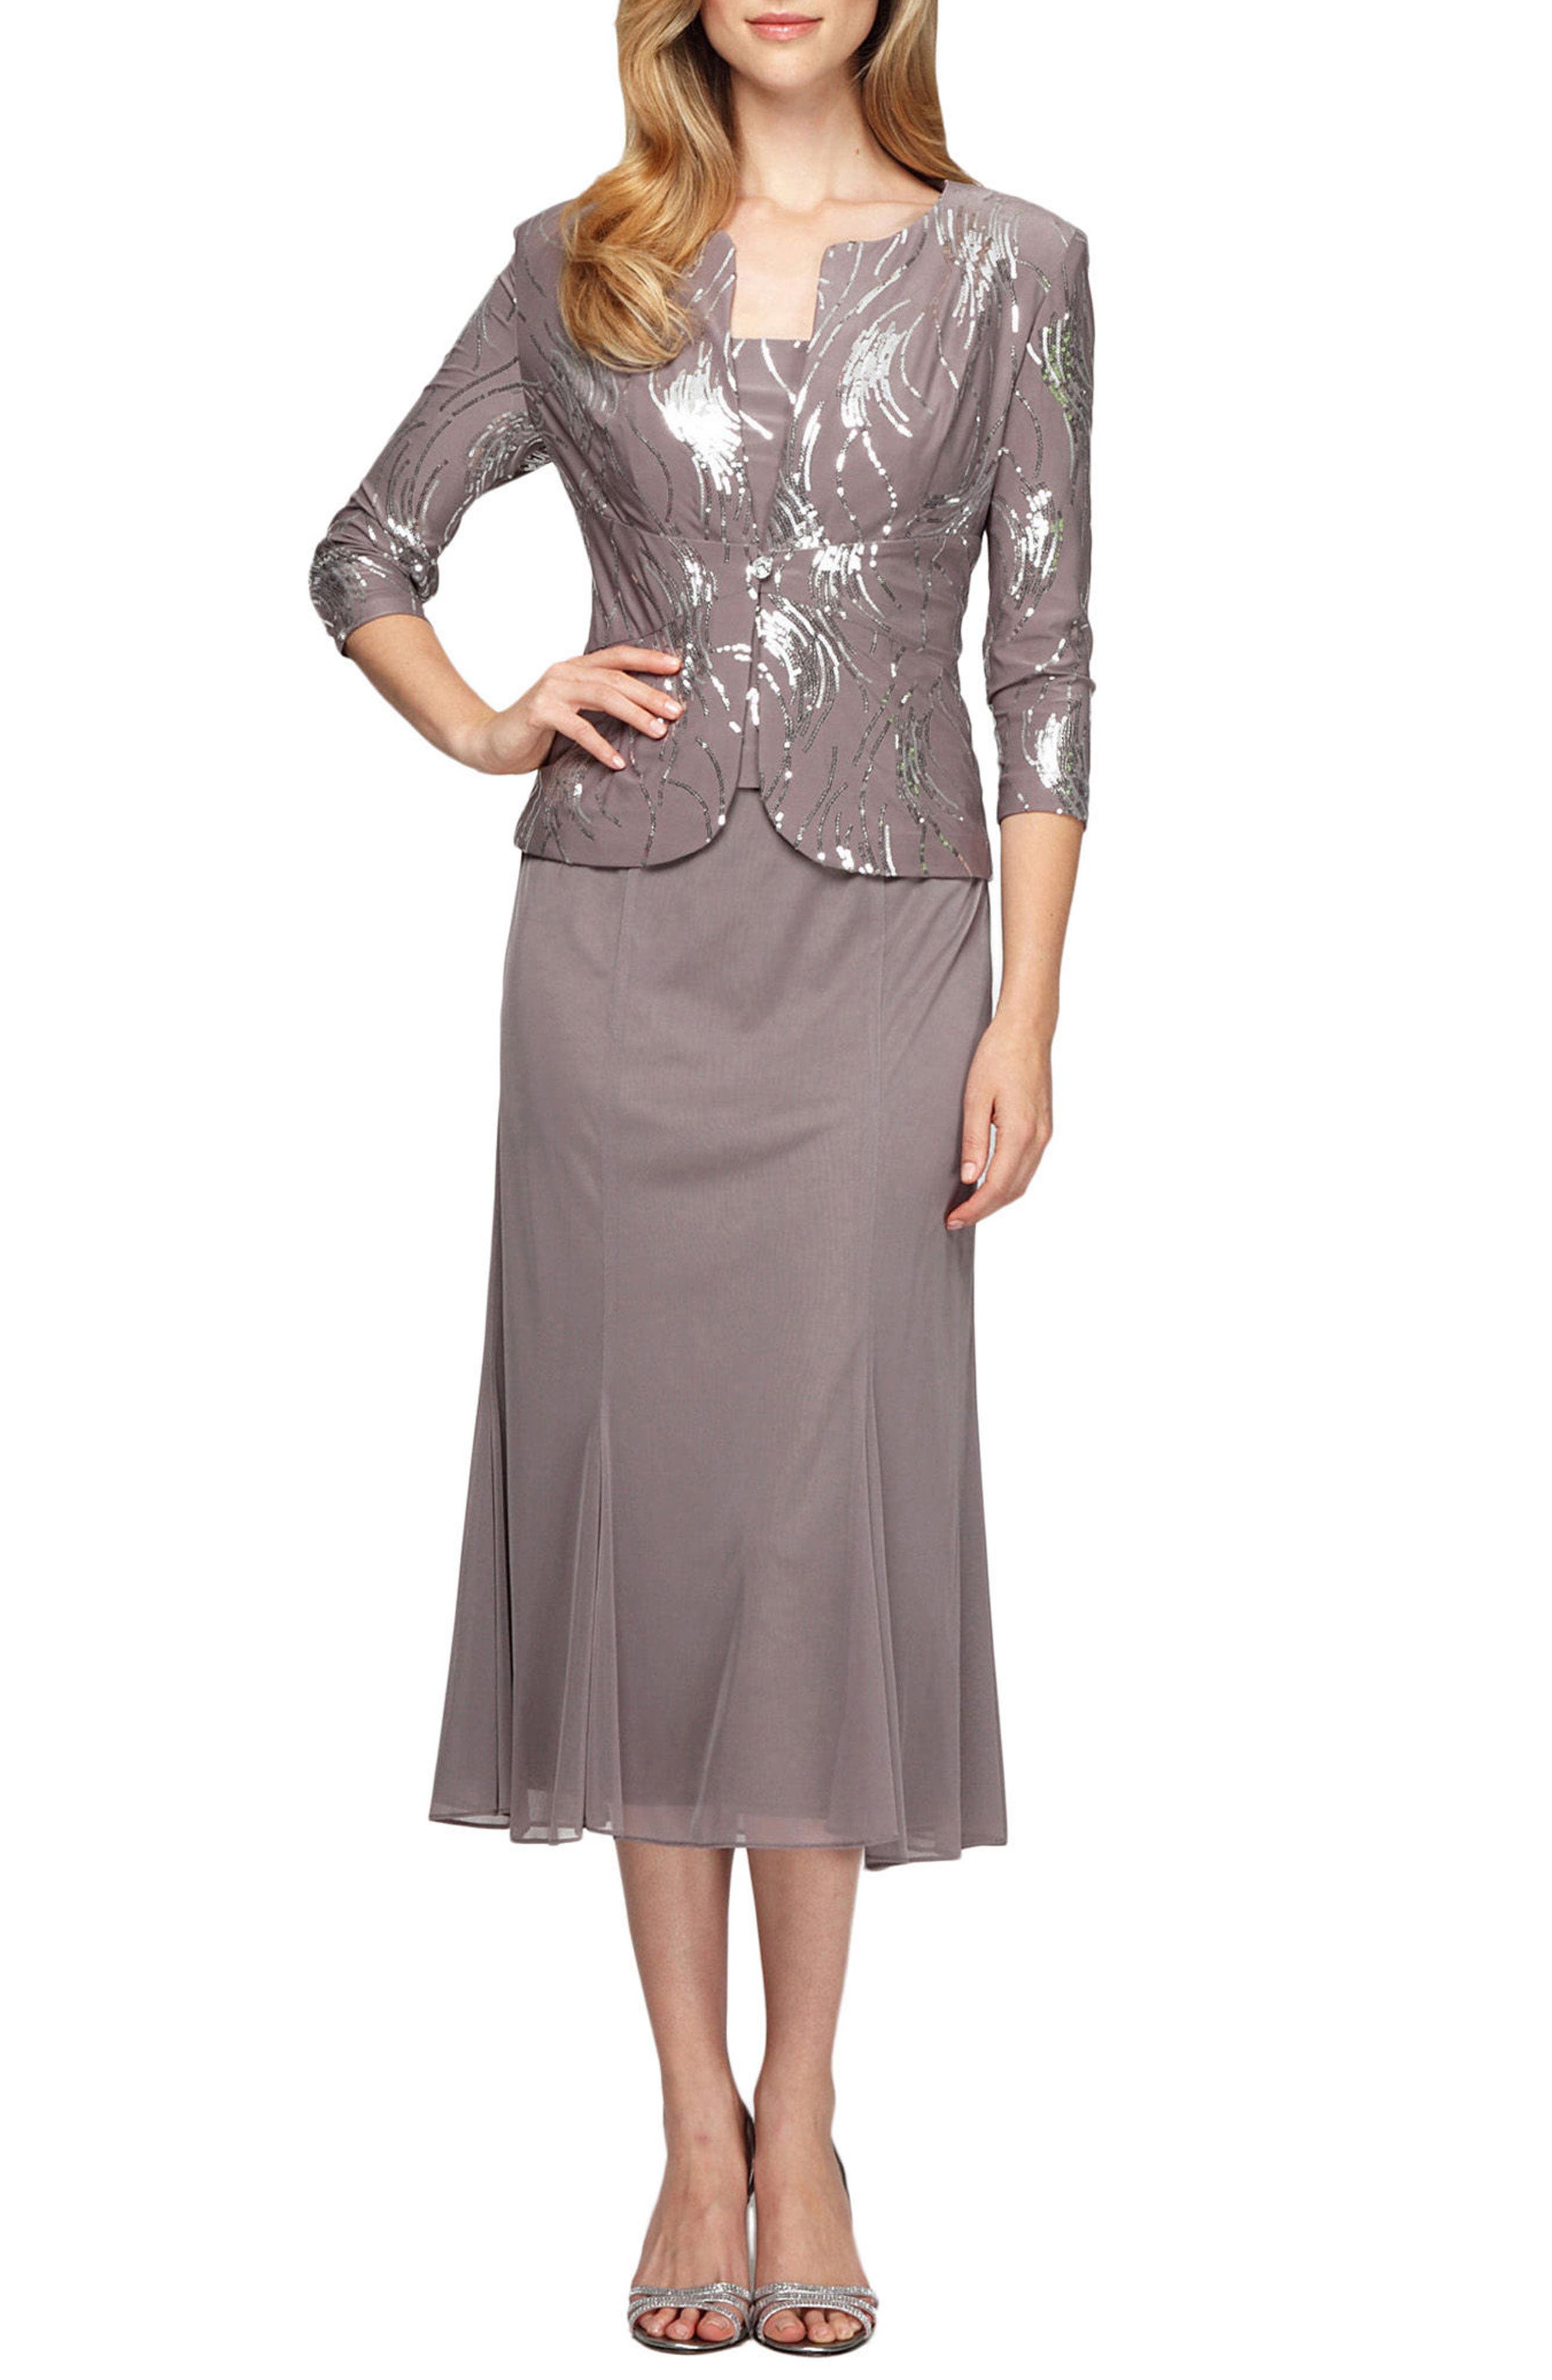 ALEX EVENINGS Midi Dress & Jacket, Main, color, PEWTER FROST